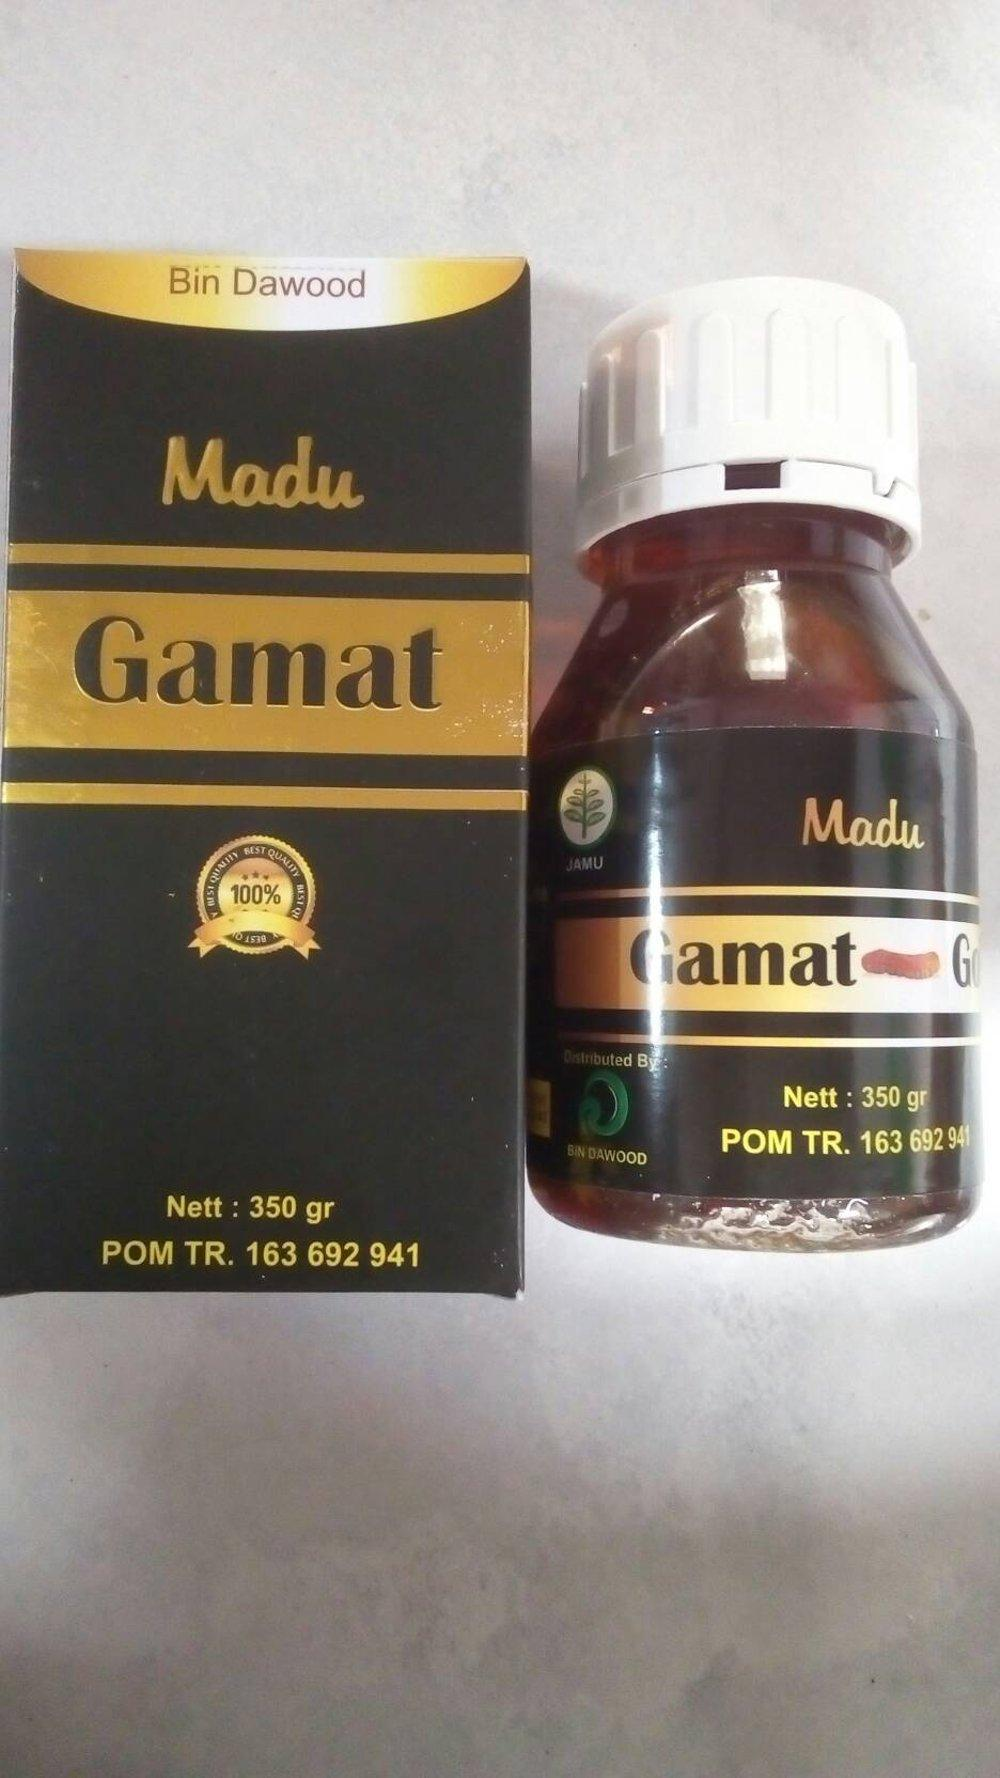 Buy Sell Cheapest Qnc Gamat Emas Best Quality Product Deals Jelly 300 Ml Dijamin Asli Ter Gold G Madu Bin Dawood